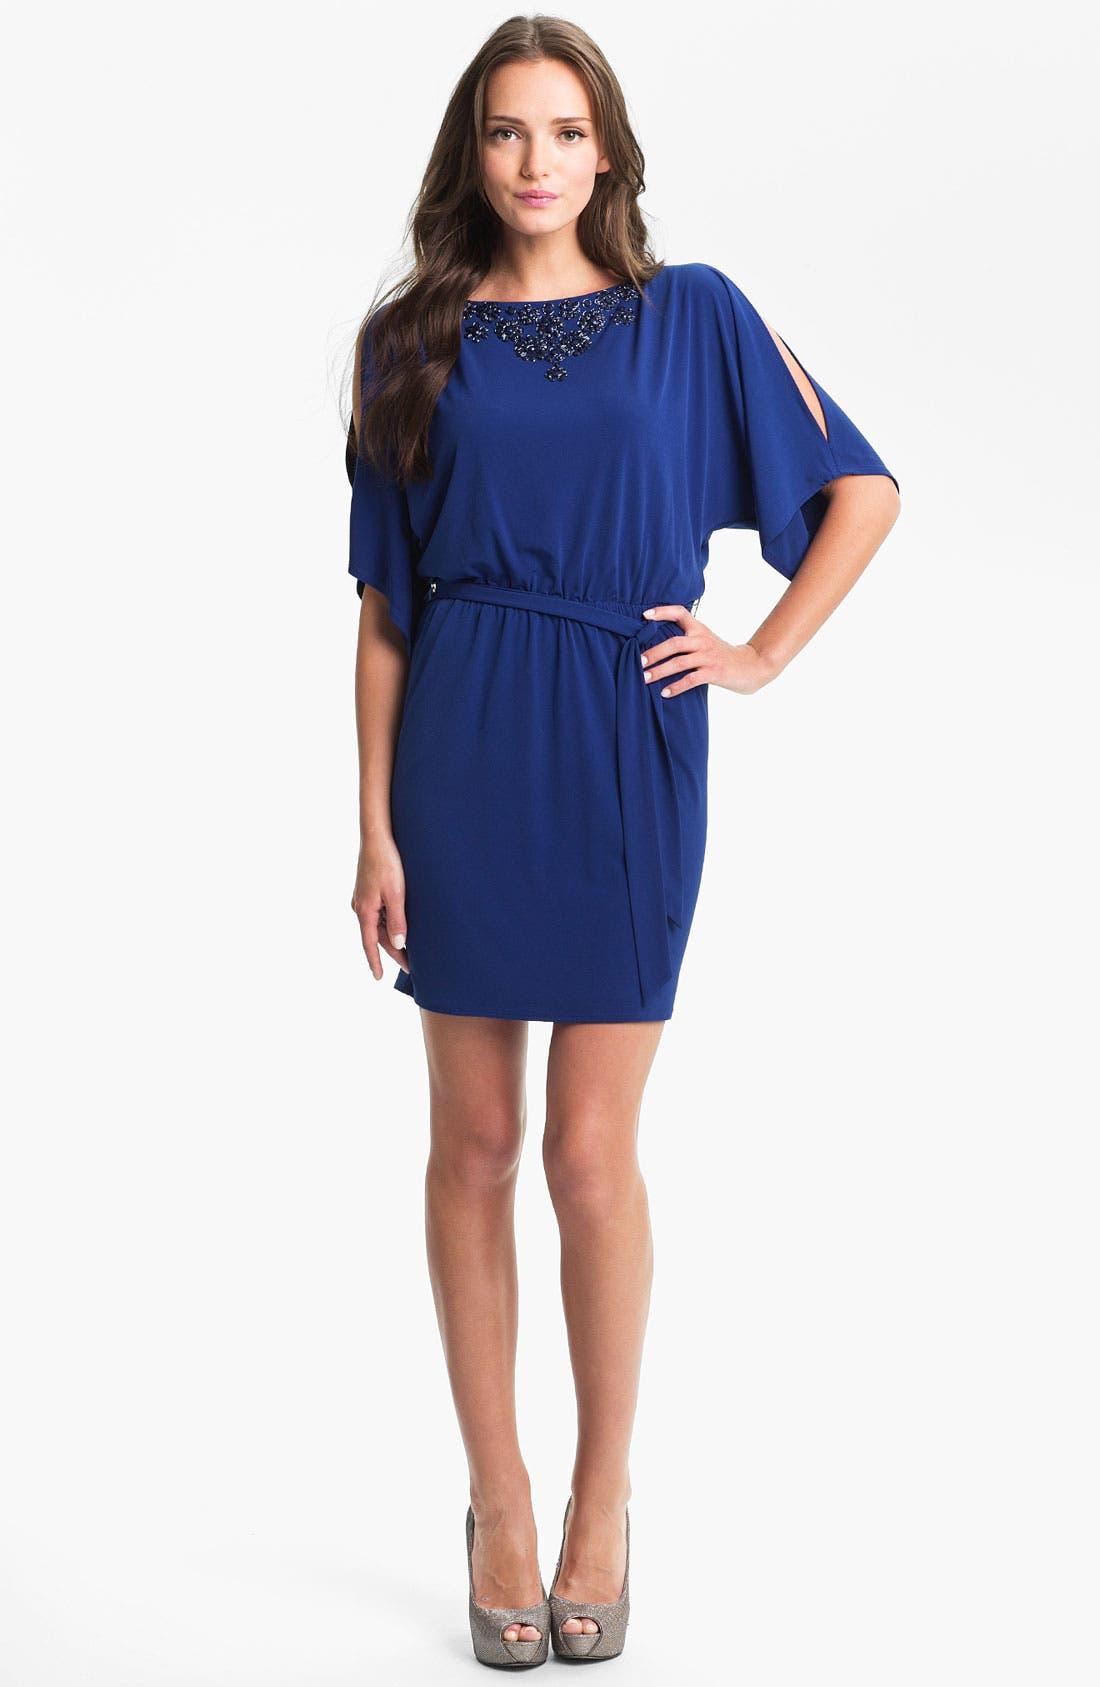 Alternate Image 1 Selected - Trina Turk 'Berenice' Beaded Blouson Dress